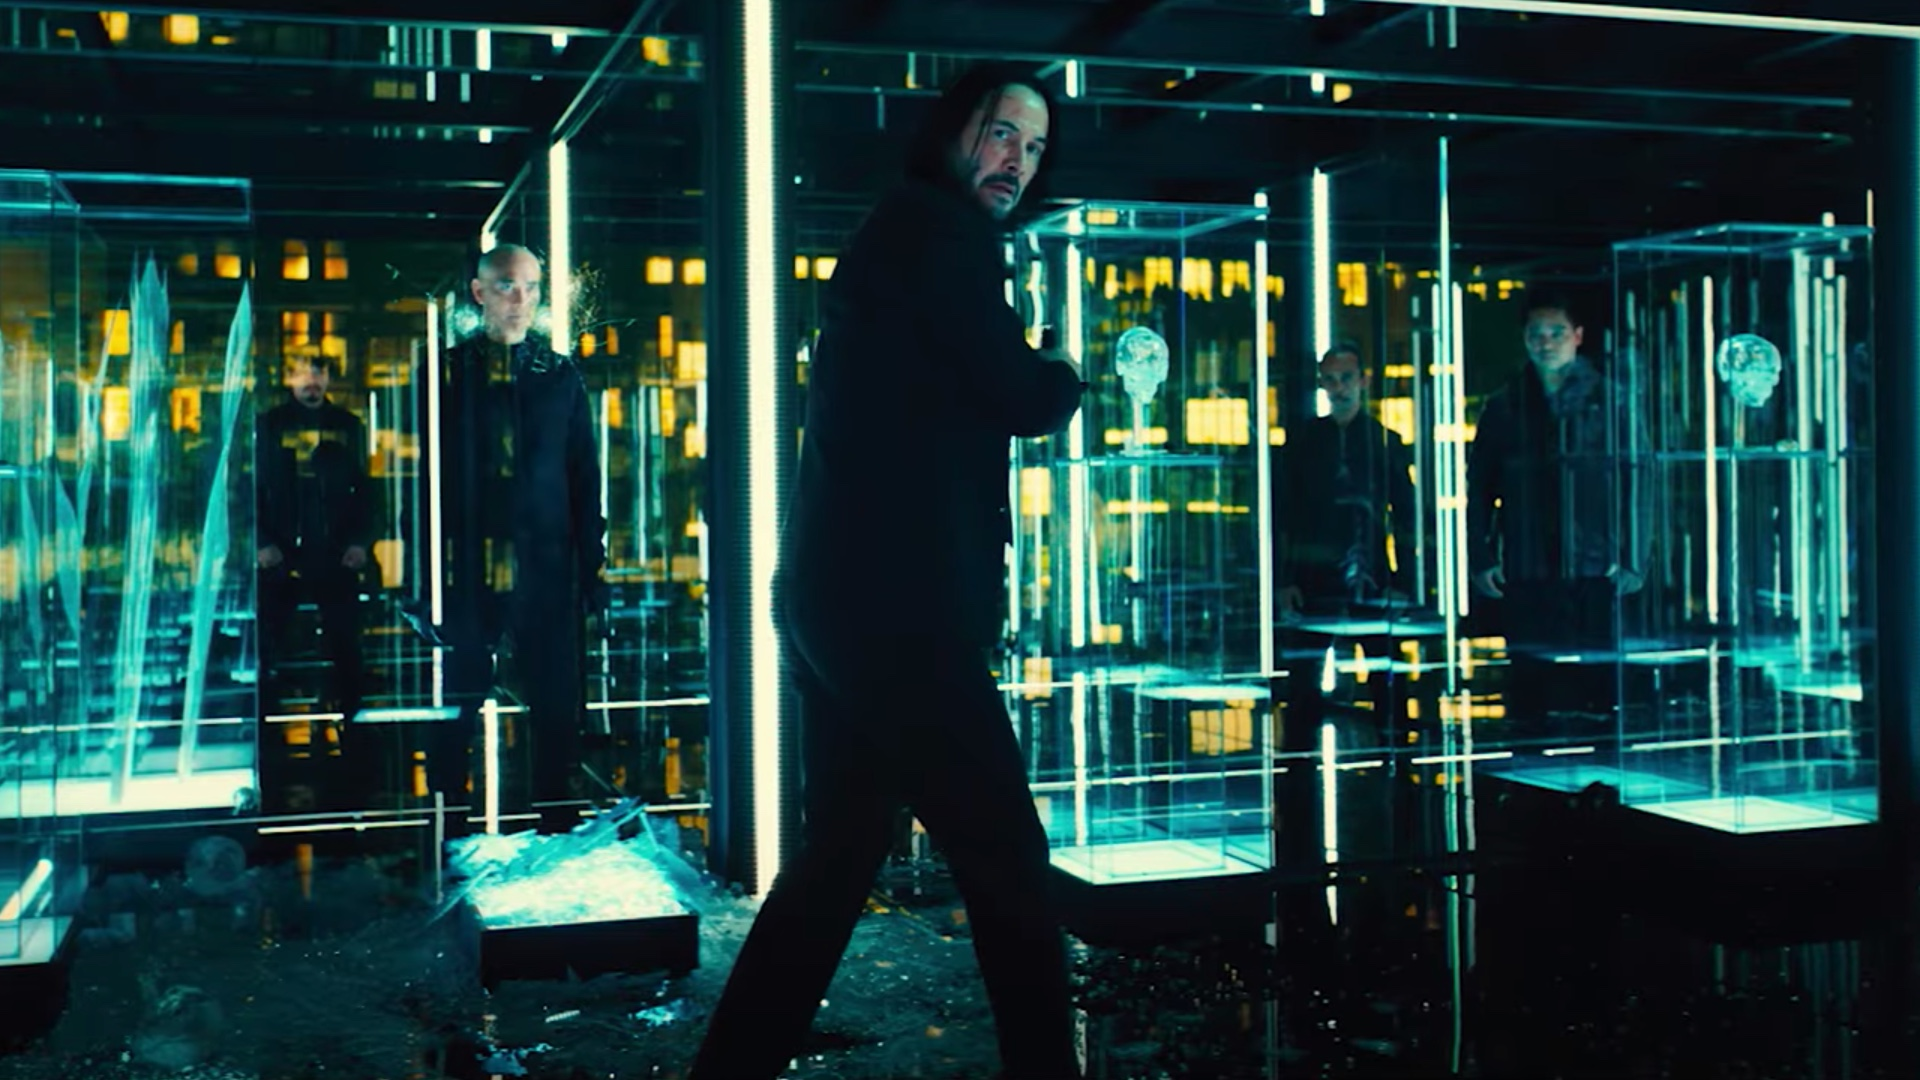 The Full Trailer For John Wick Chapter 3 Parabellum Has Blasted